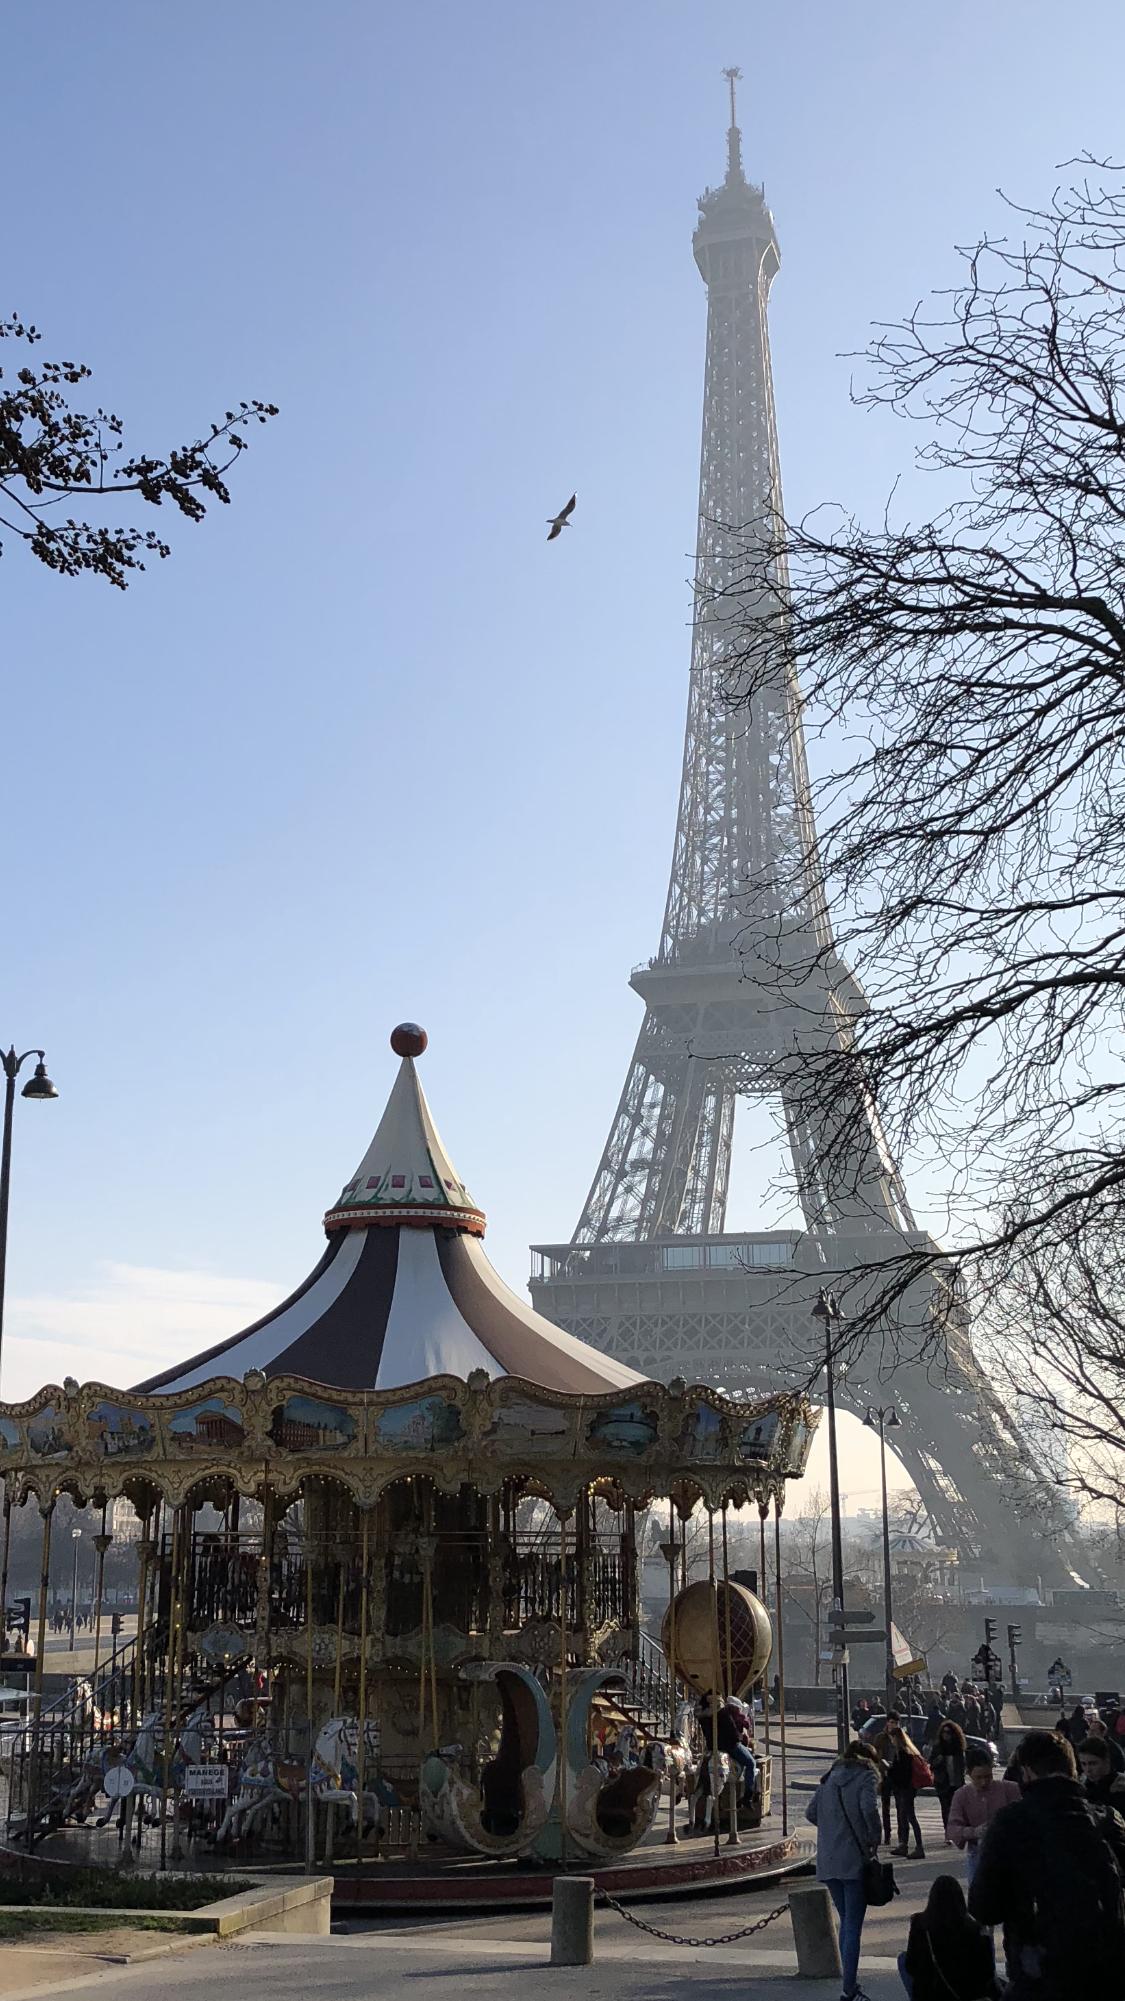 Carousel Eiffel Tower 2018 Paris Frnace برج ايفل باريس فرنسا ٢٠١٨ Eiffel Tower Photography City Lights Wallpaper Ocean Sunset Photography